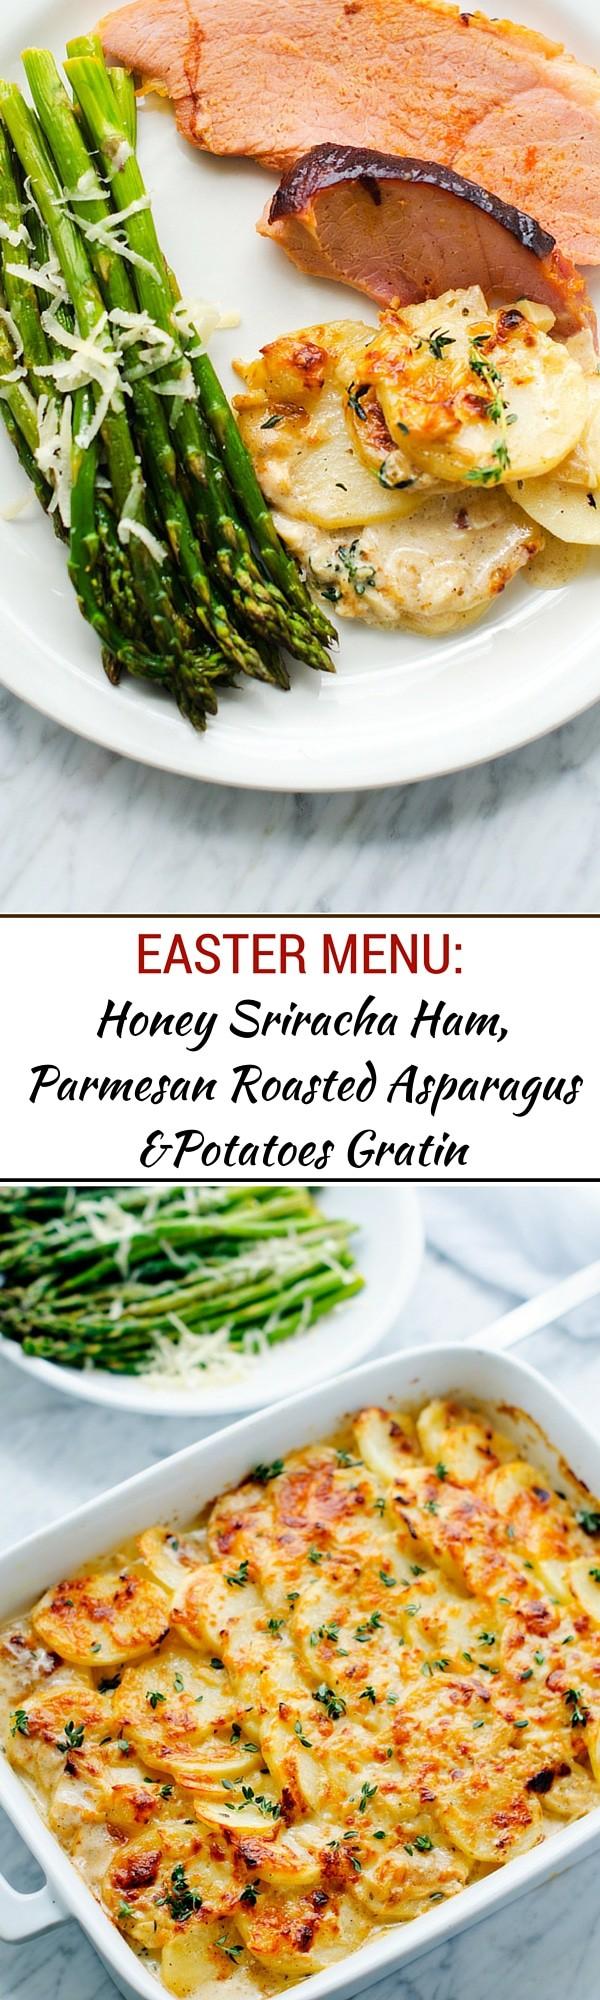 Our Easter Menu: Honey Sriracha Ham, Goat Cheese Potatoes Gratin & Roasted Asparagus - - WendyPolisi.com